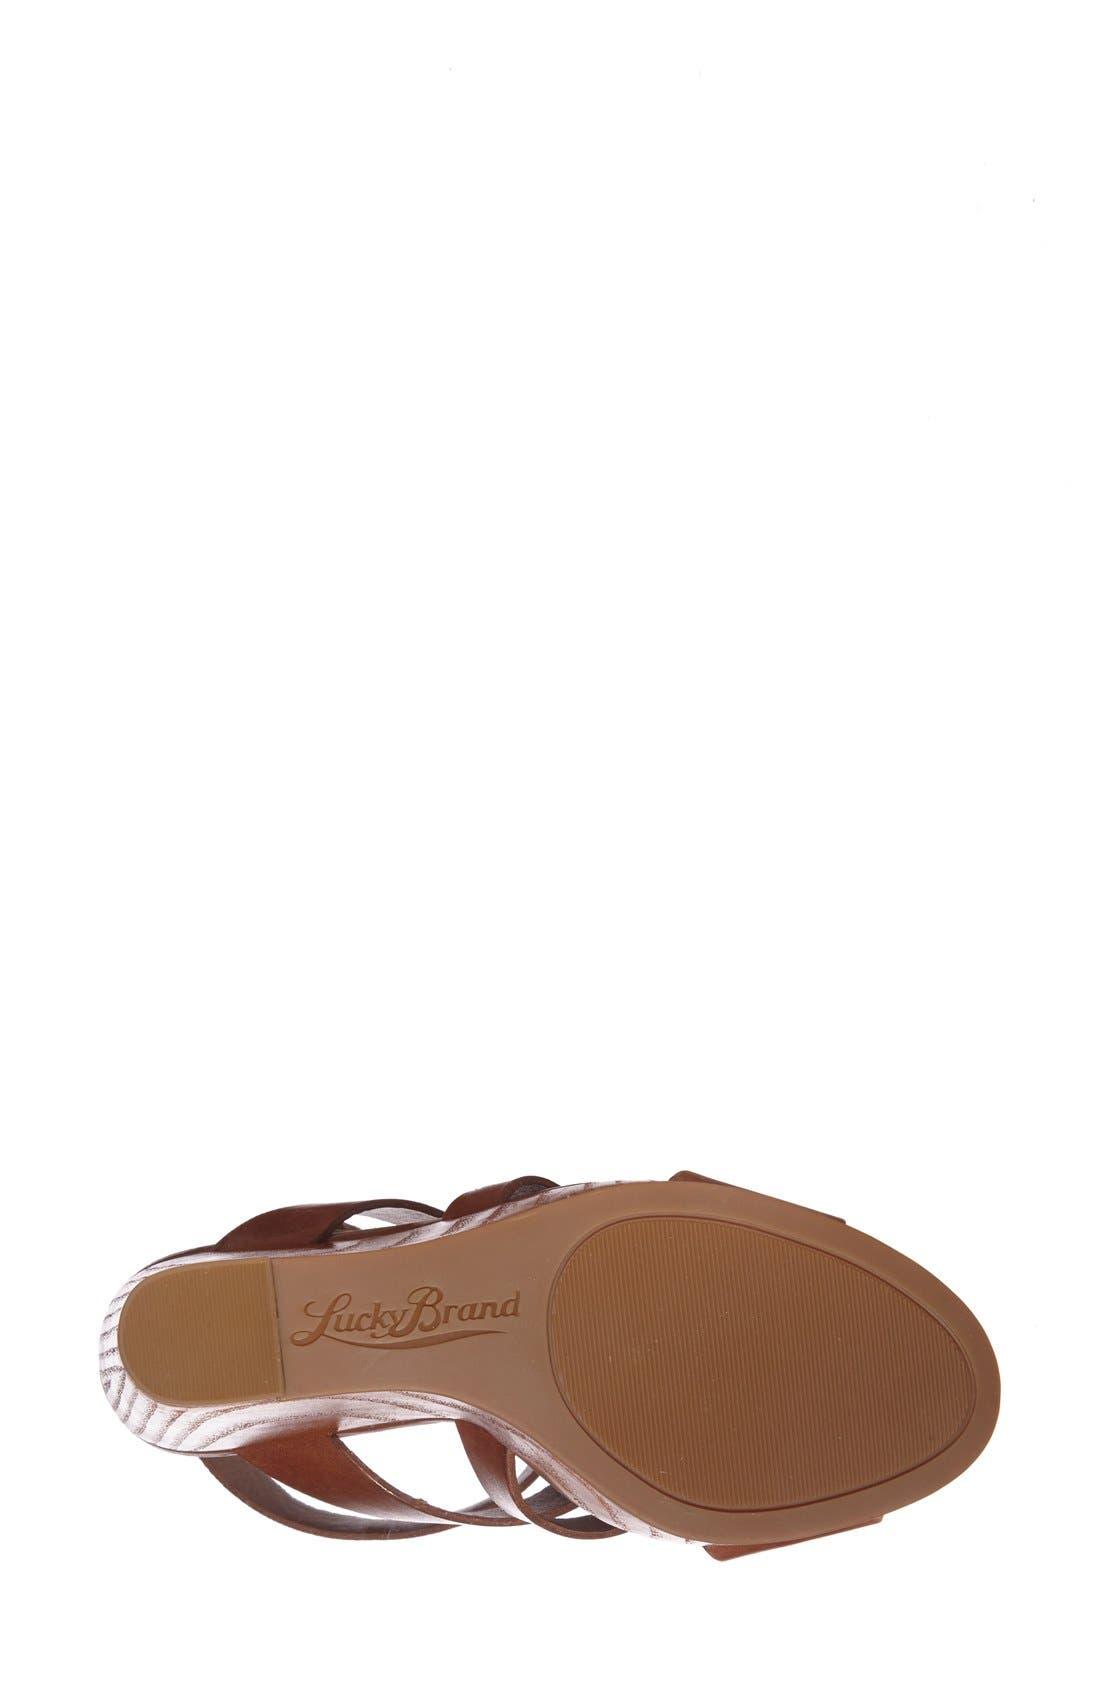 Alternate Image 4  - Lucky Brand 'Roselyn' Leather Caged Platform Sandal (Women)